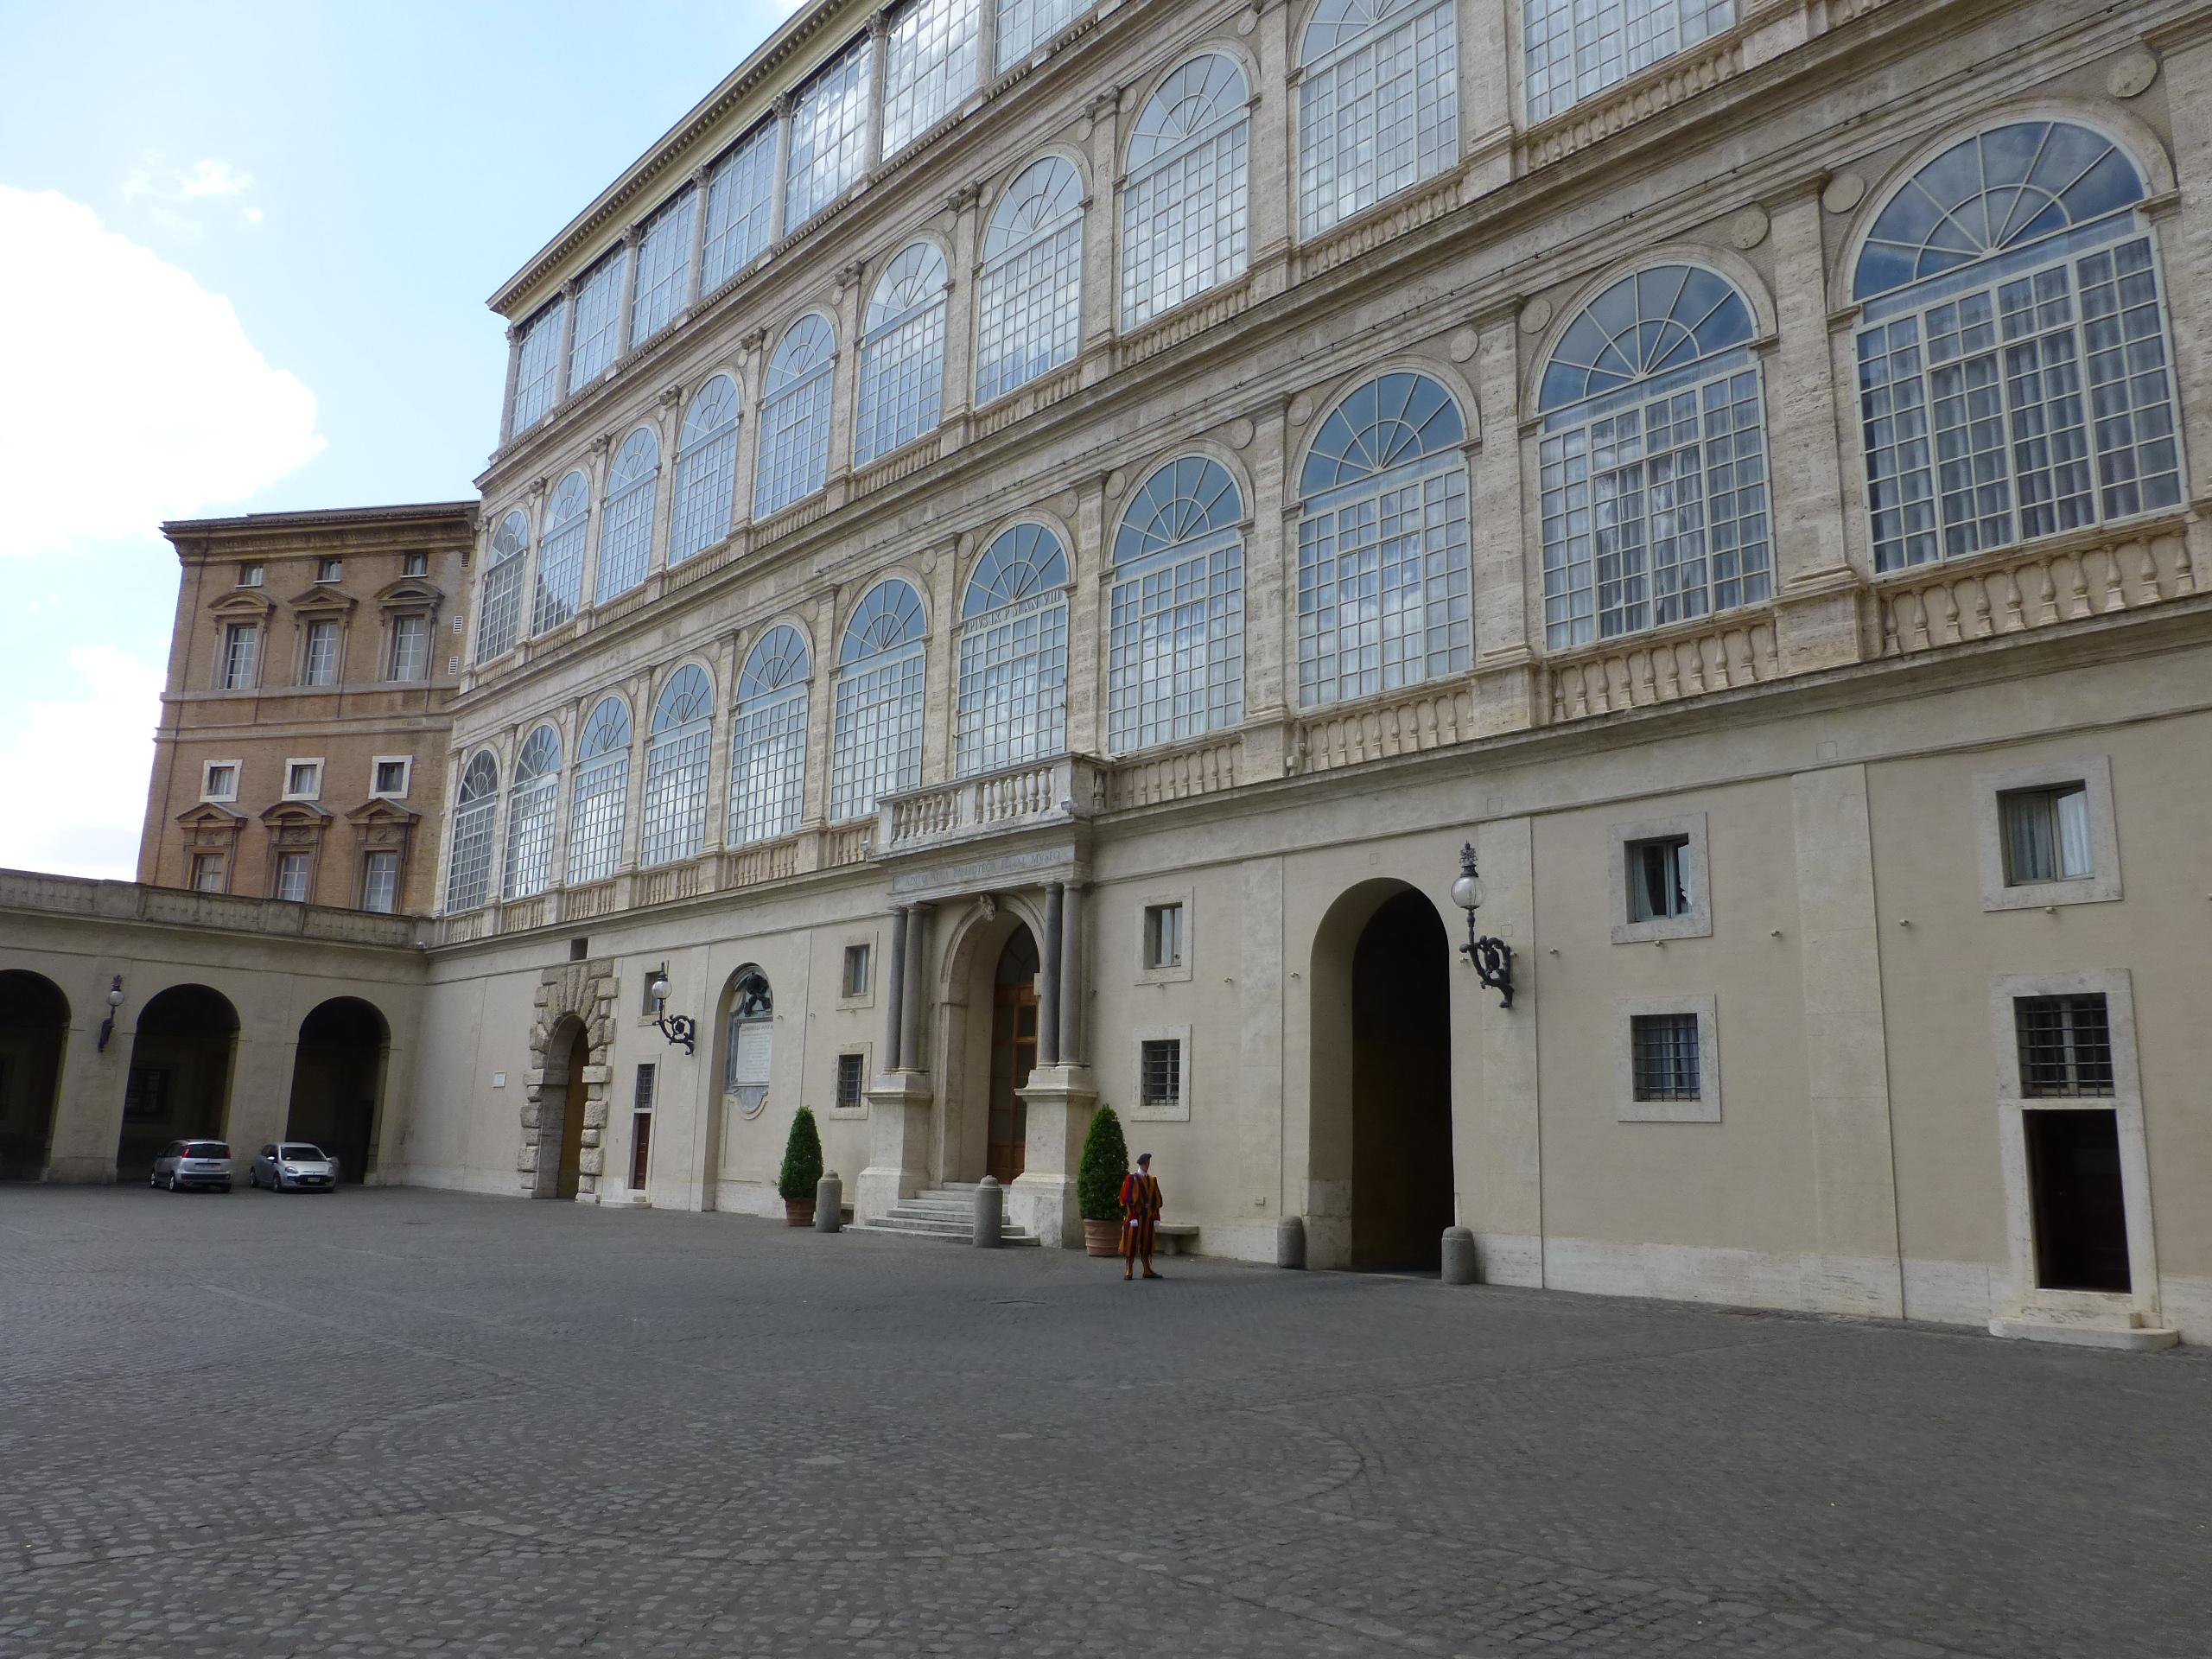 Apostolic Palace Facade